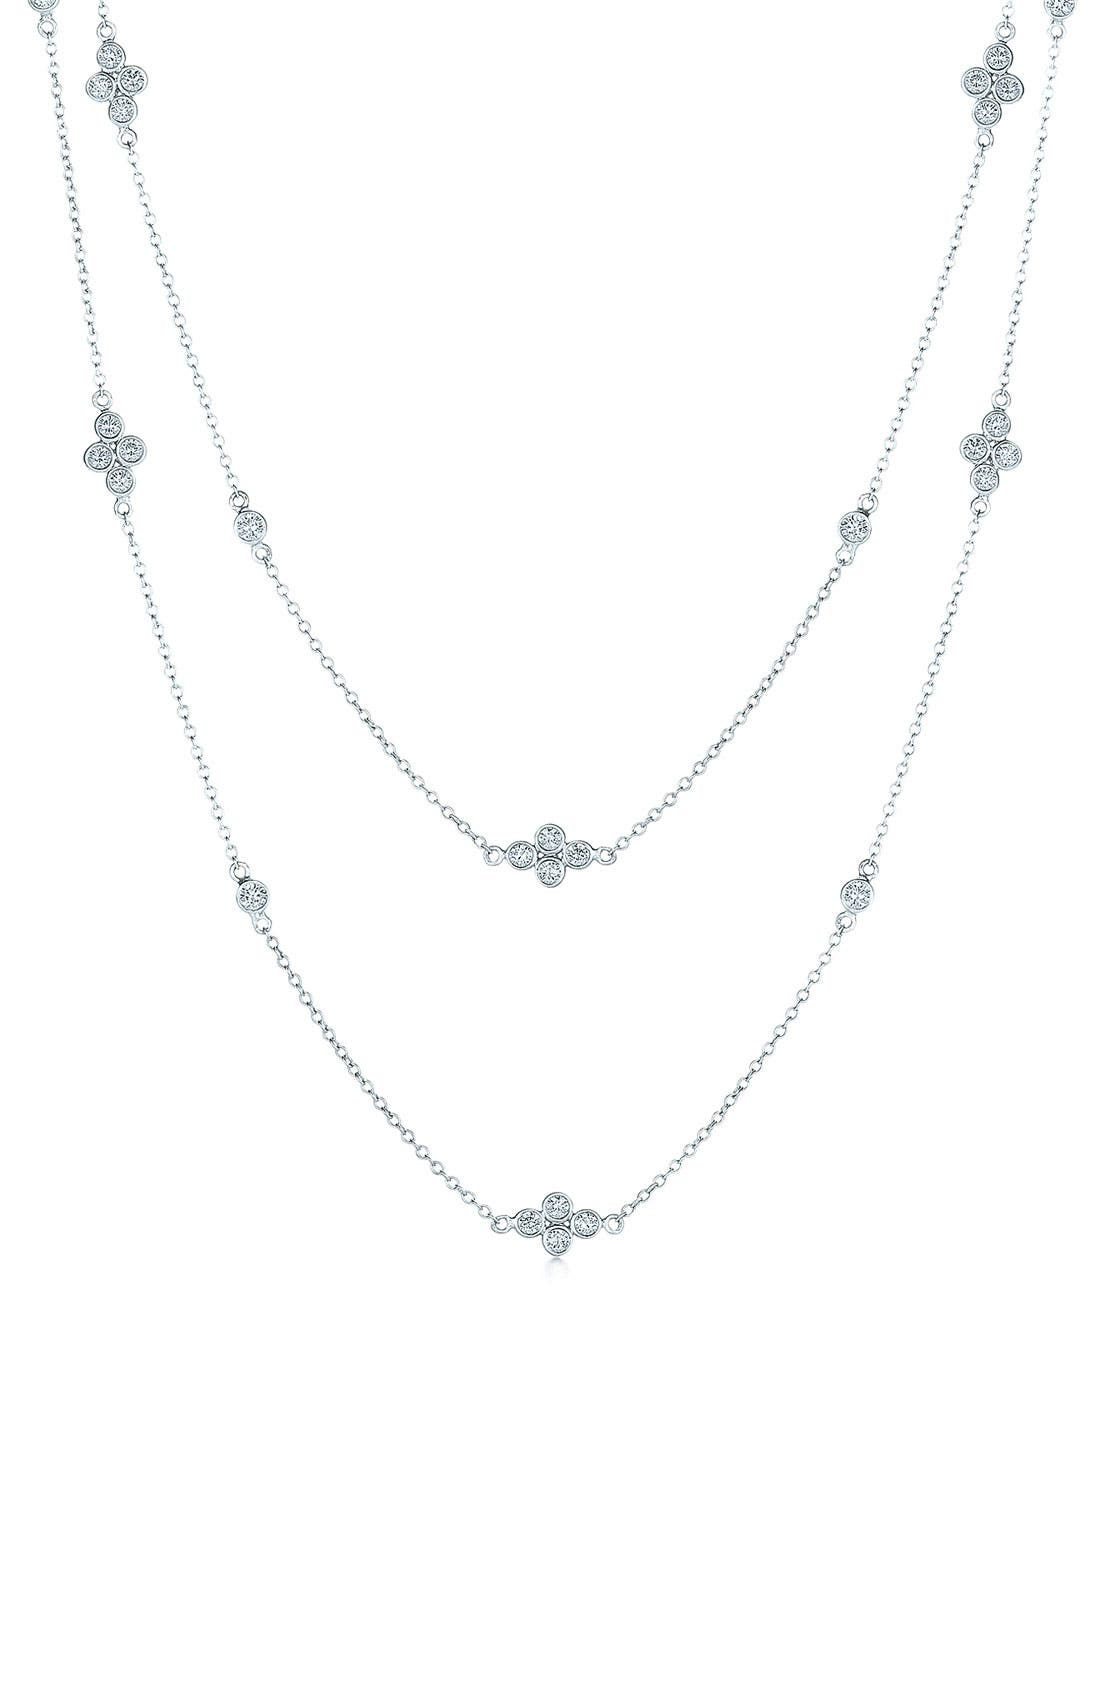 'Diamond Strings' Long Diamond Station Necklace,                         Main,                         color, WHITE GOLD